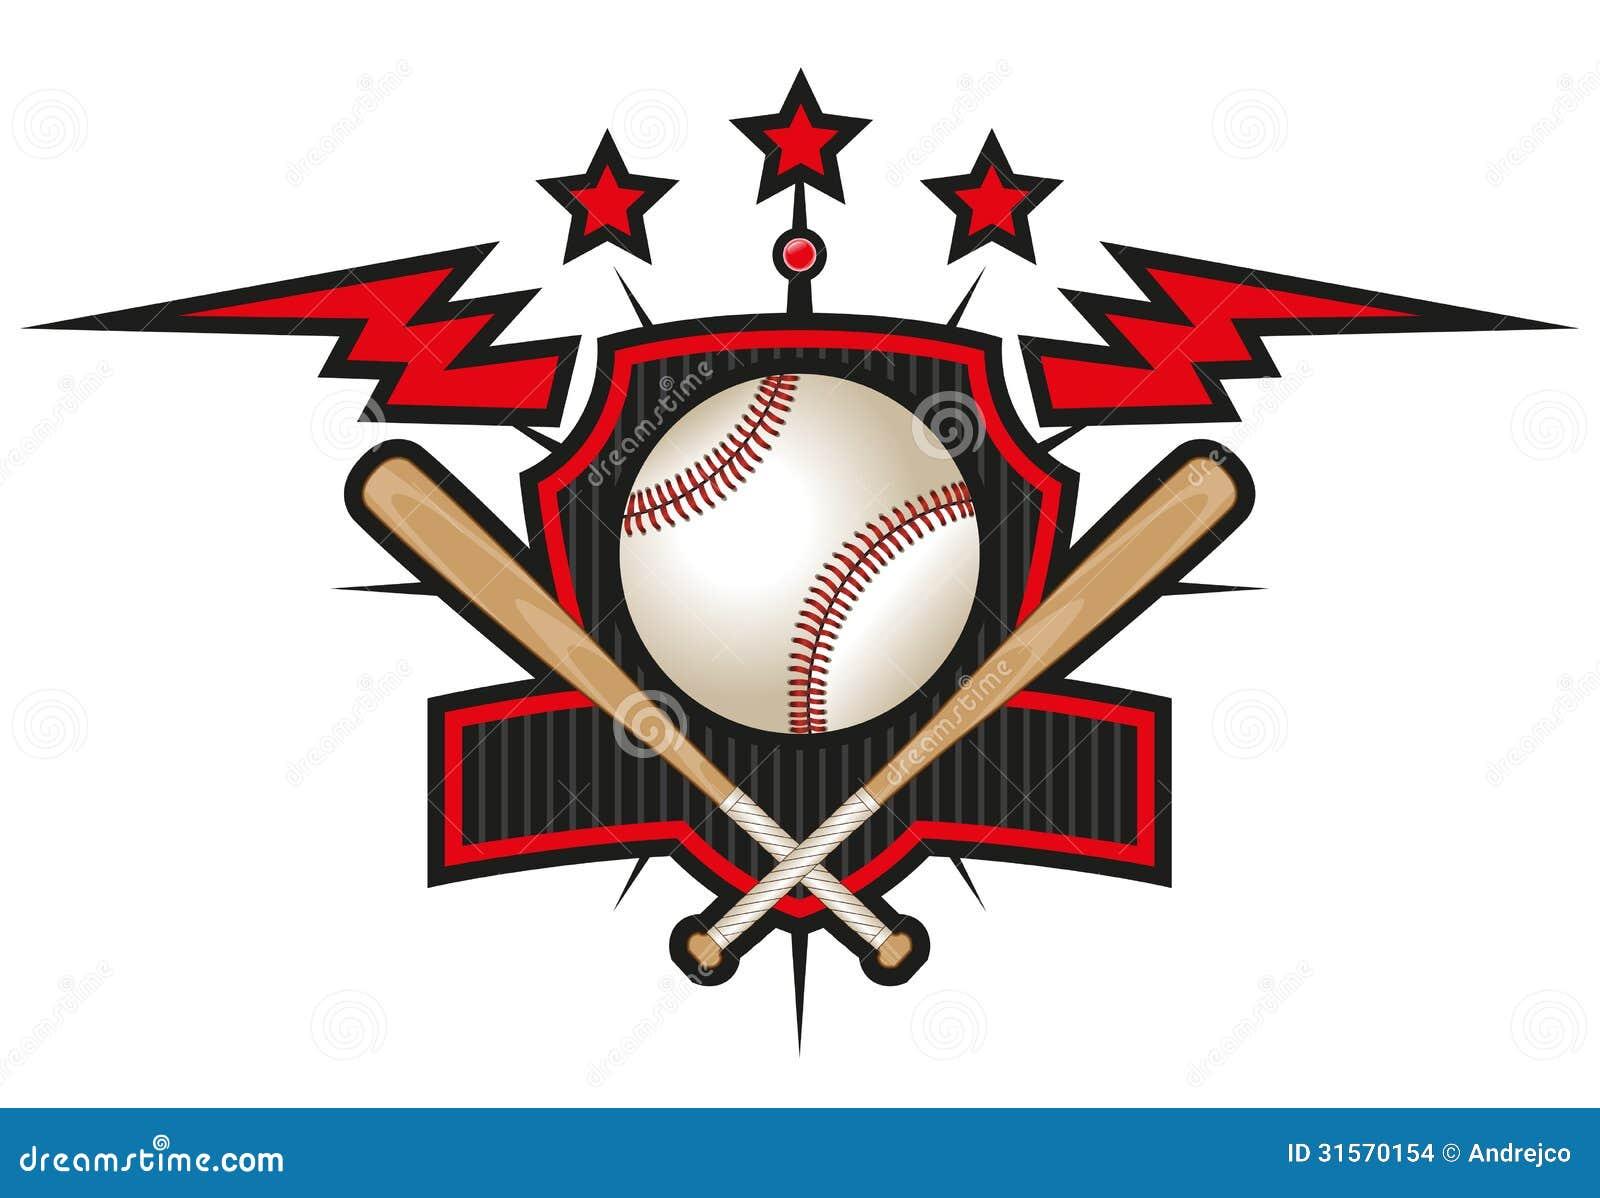 softball wallpaper